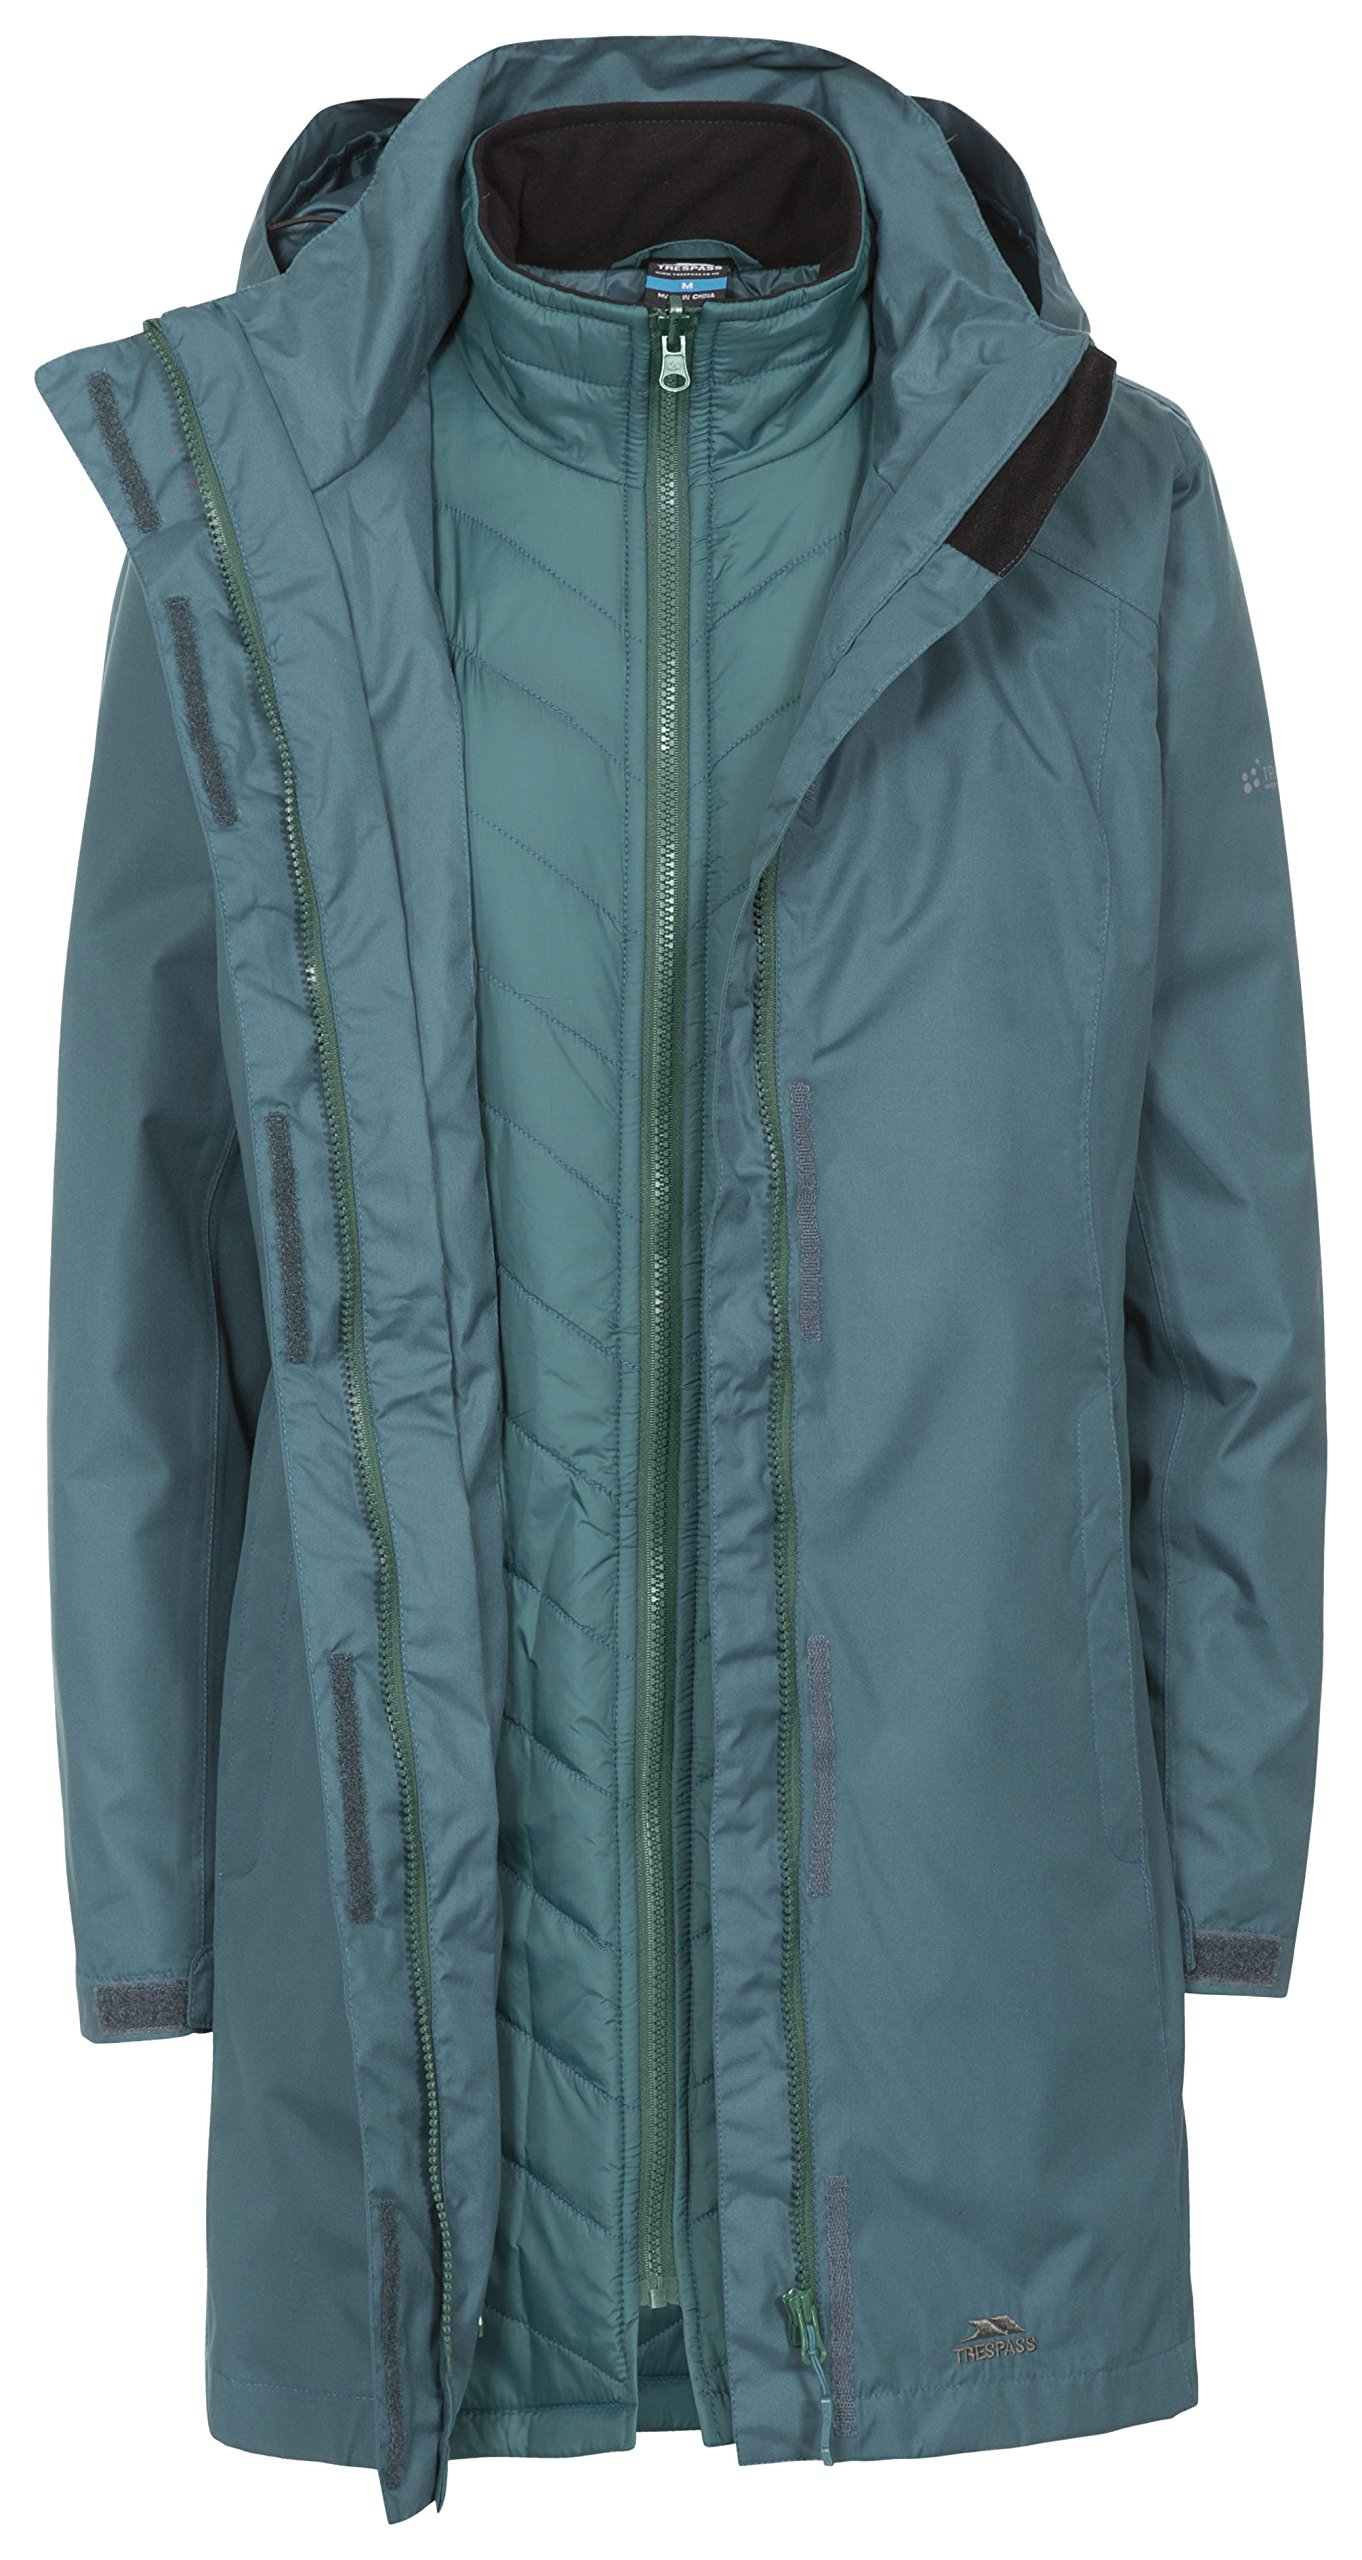 Trespass Alissa II Womens Waterproof 3 in 1 Jacket with Hood 1